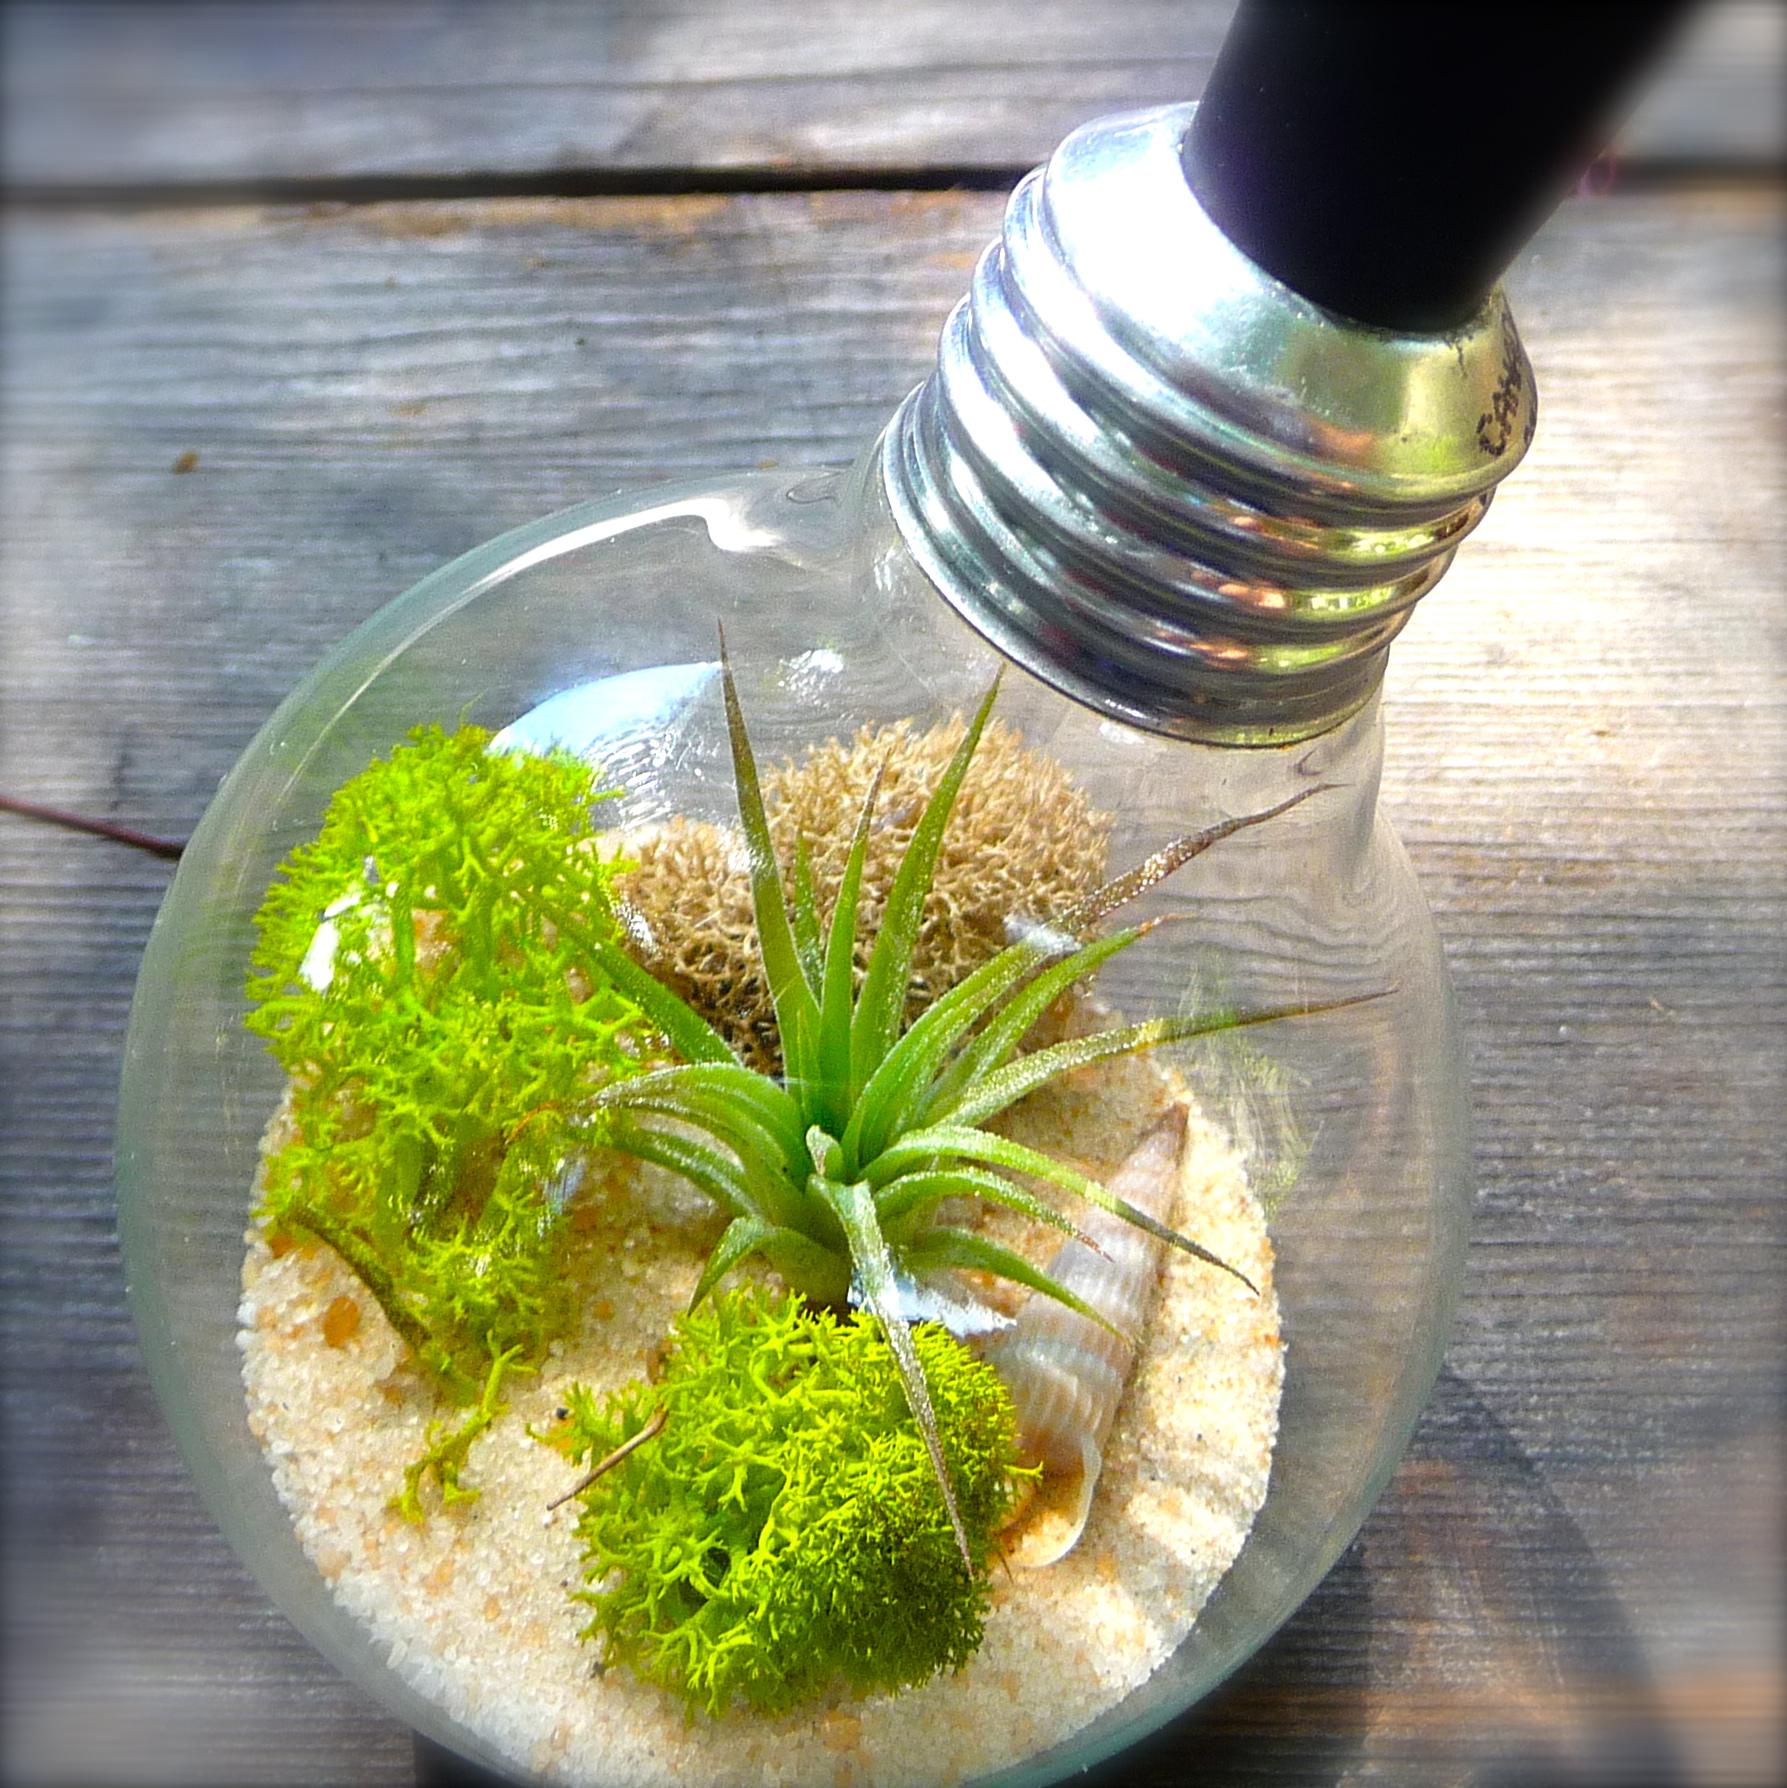 Light Bulb Terrarium Extinction?